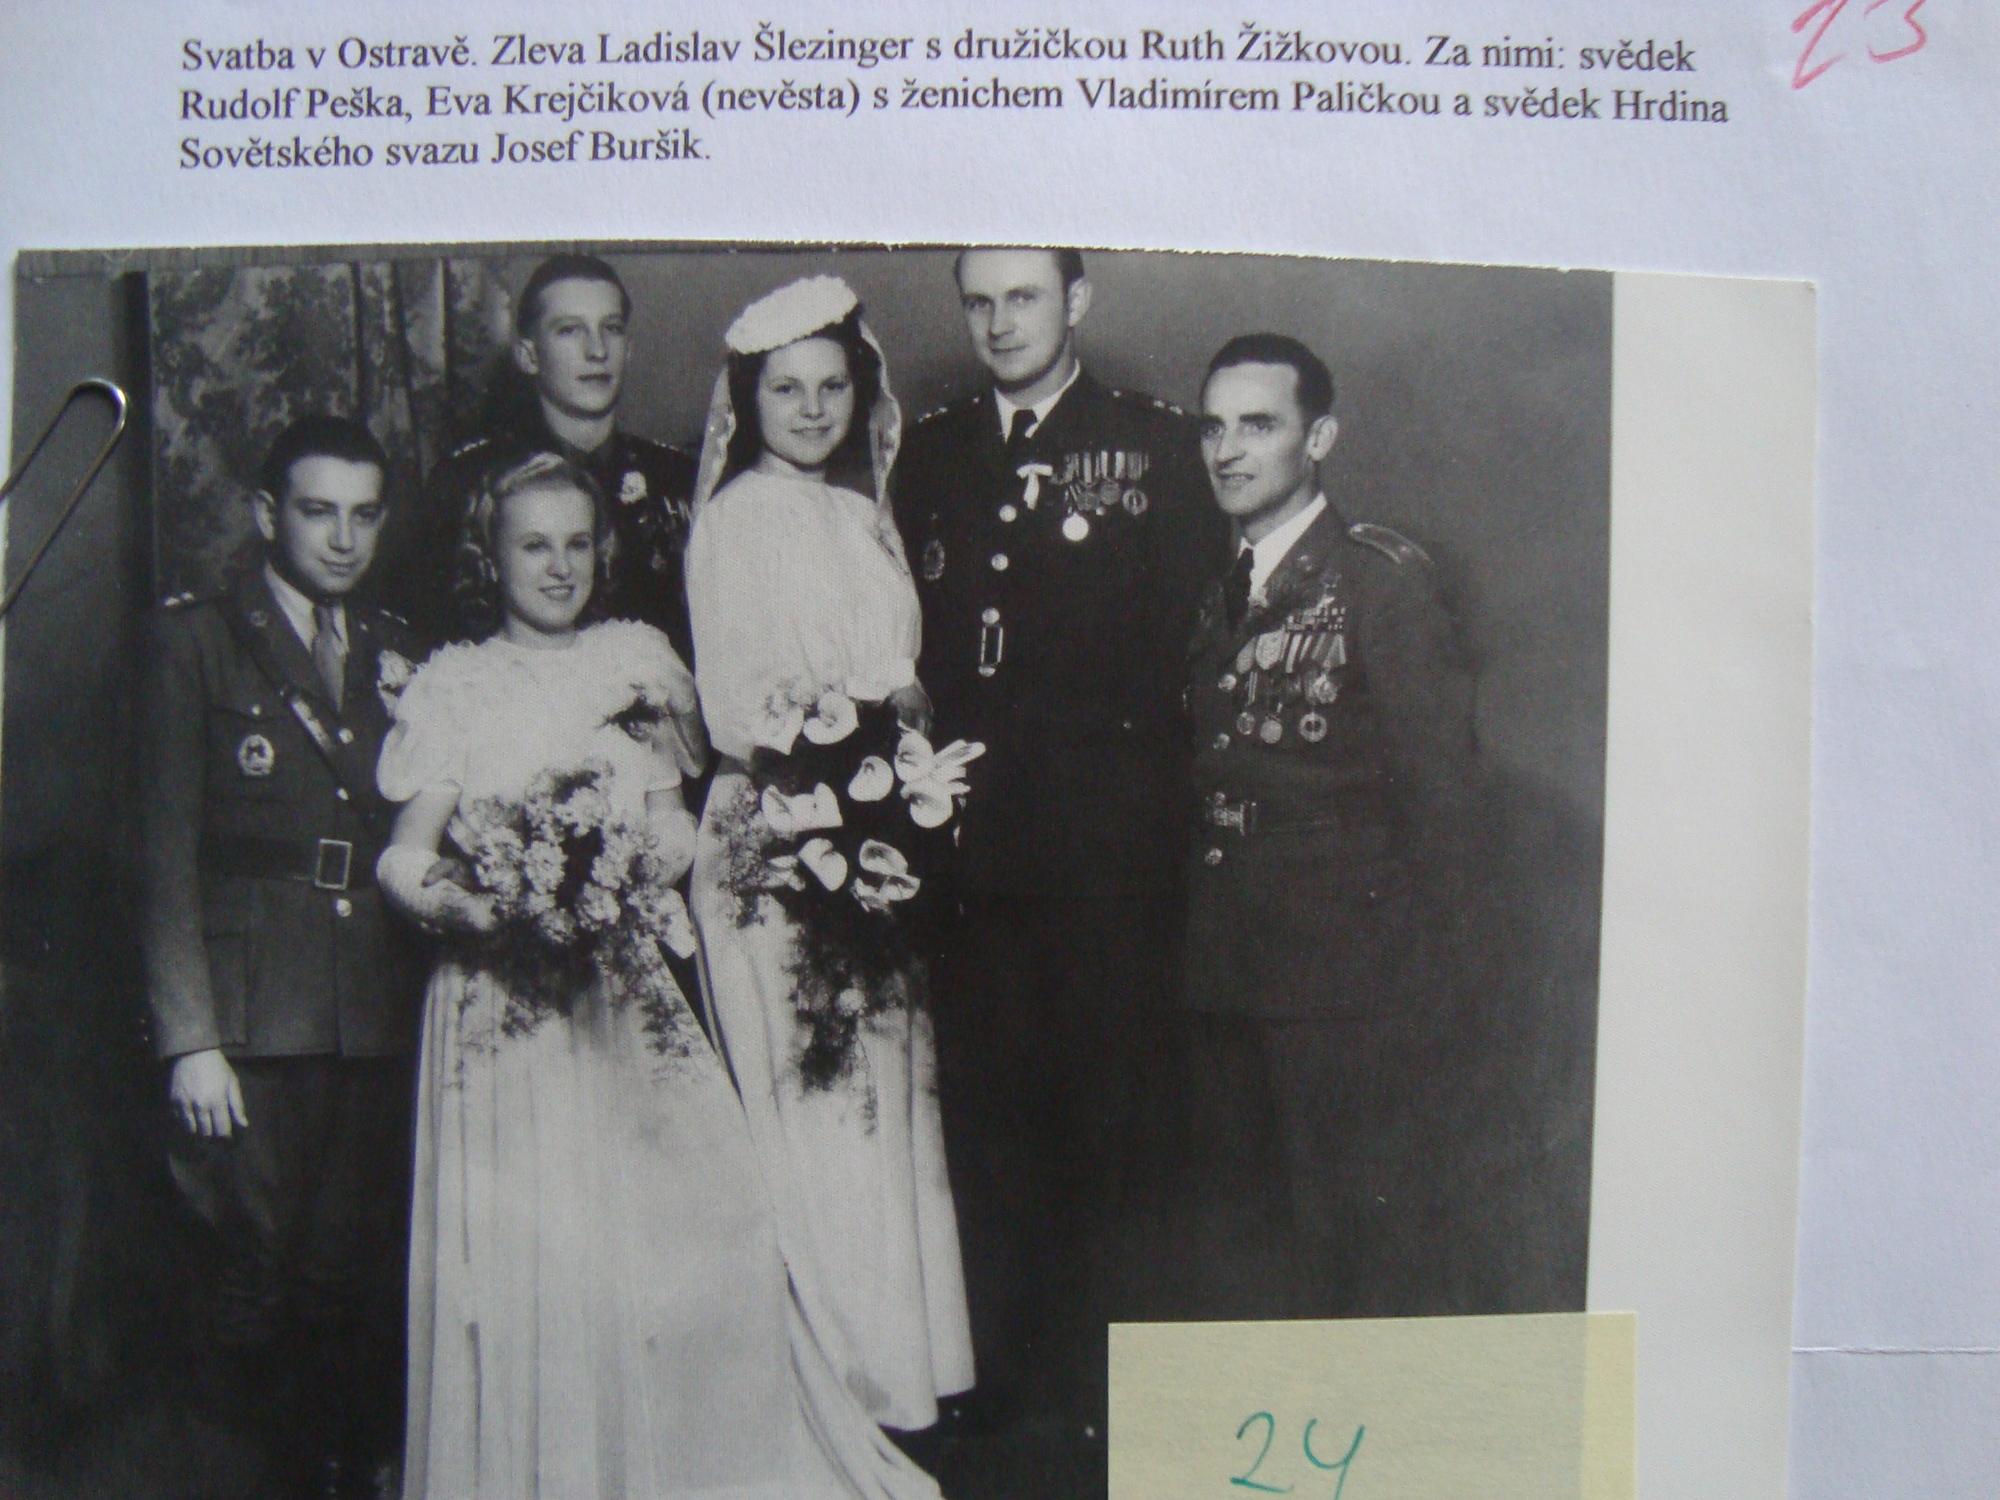 fa0edf5ec189 Svatba Vladimíra Paličky v Ostravě